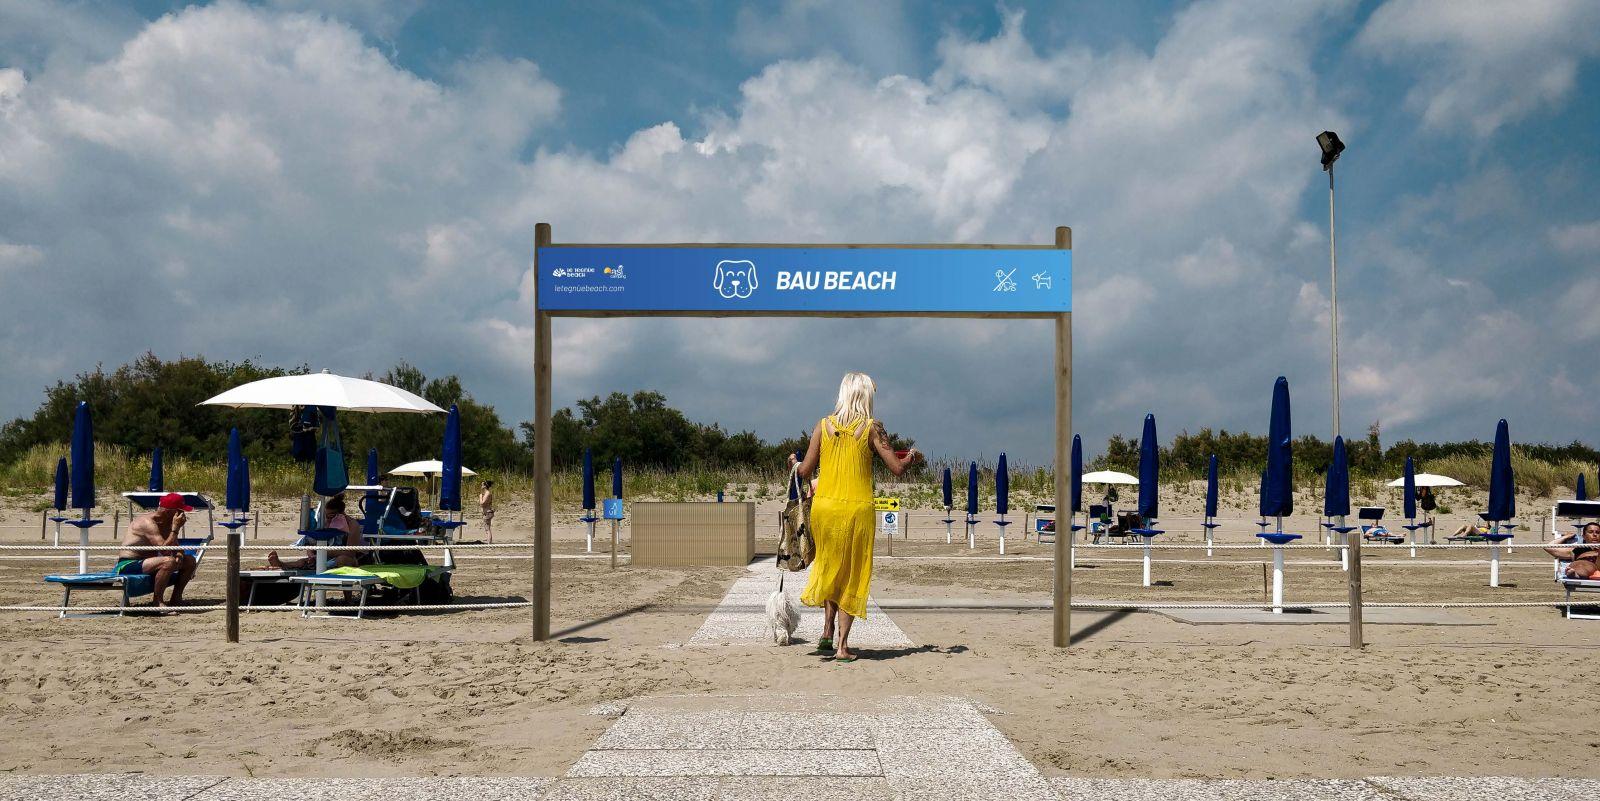 Bau Beach lL Tegnùe Chioggia Mypethotel